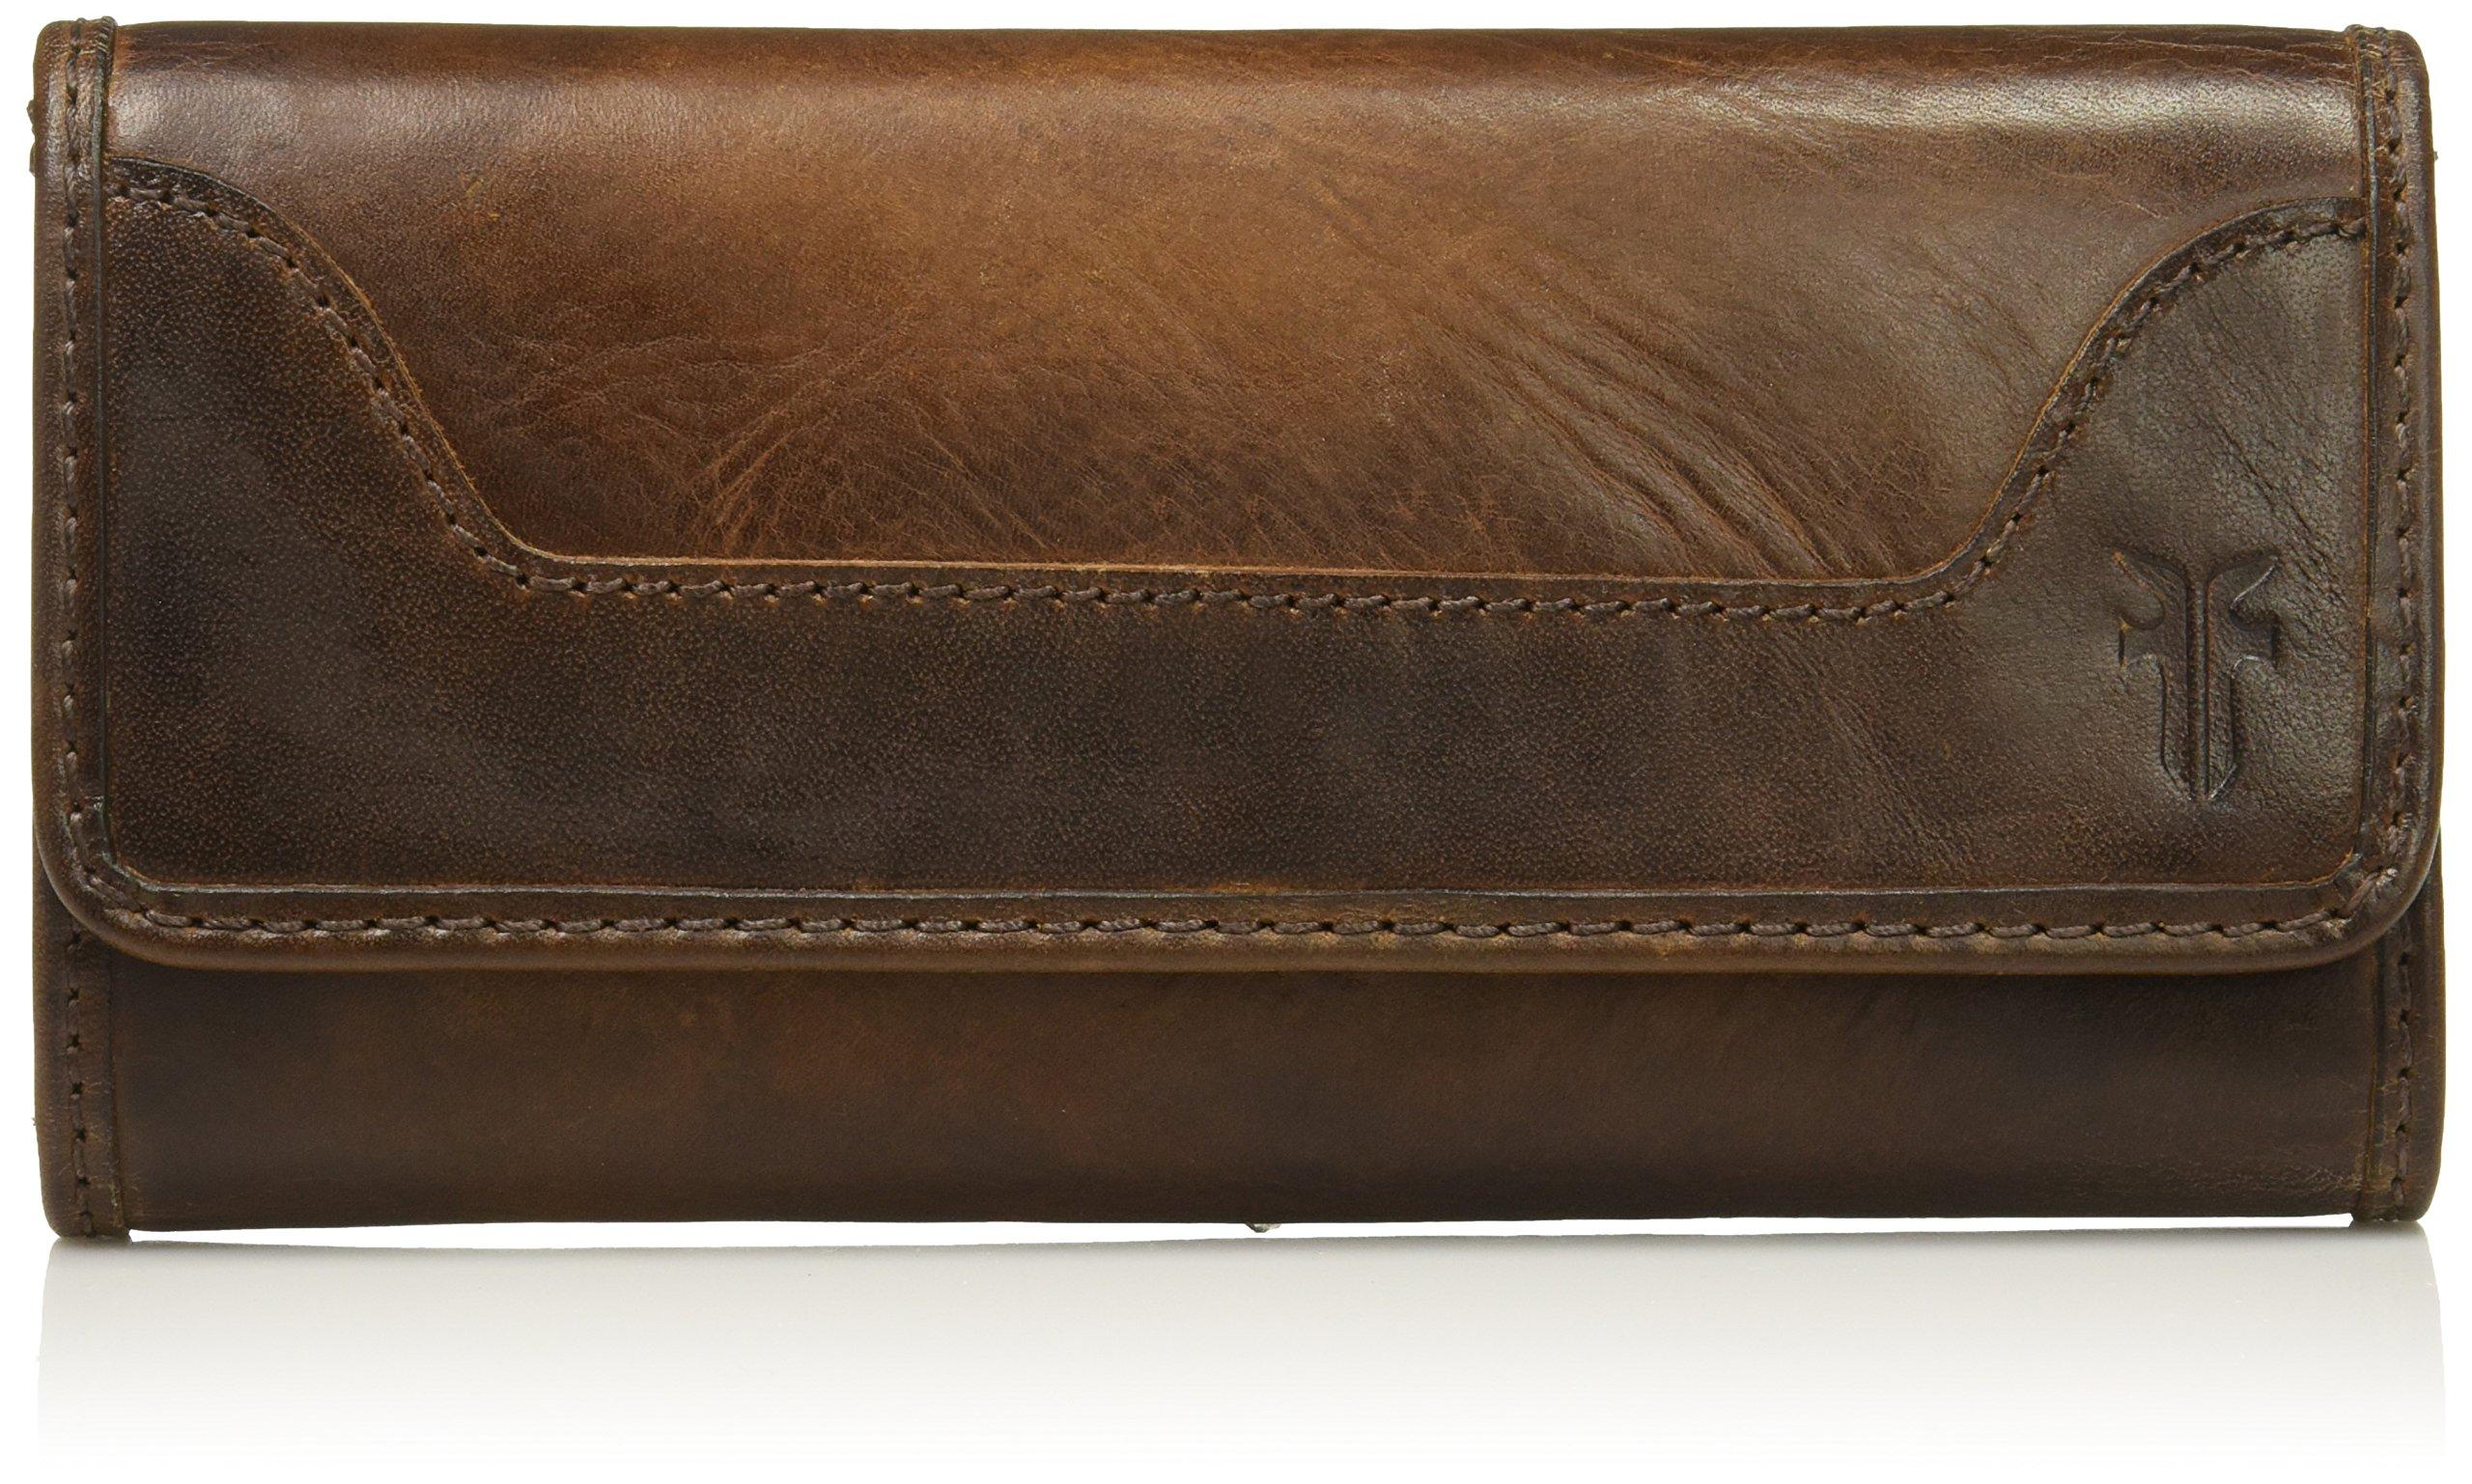 Melissa Continental Snap Wallet, Dark Brown